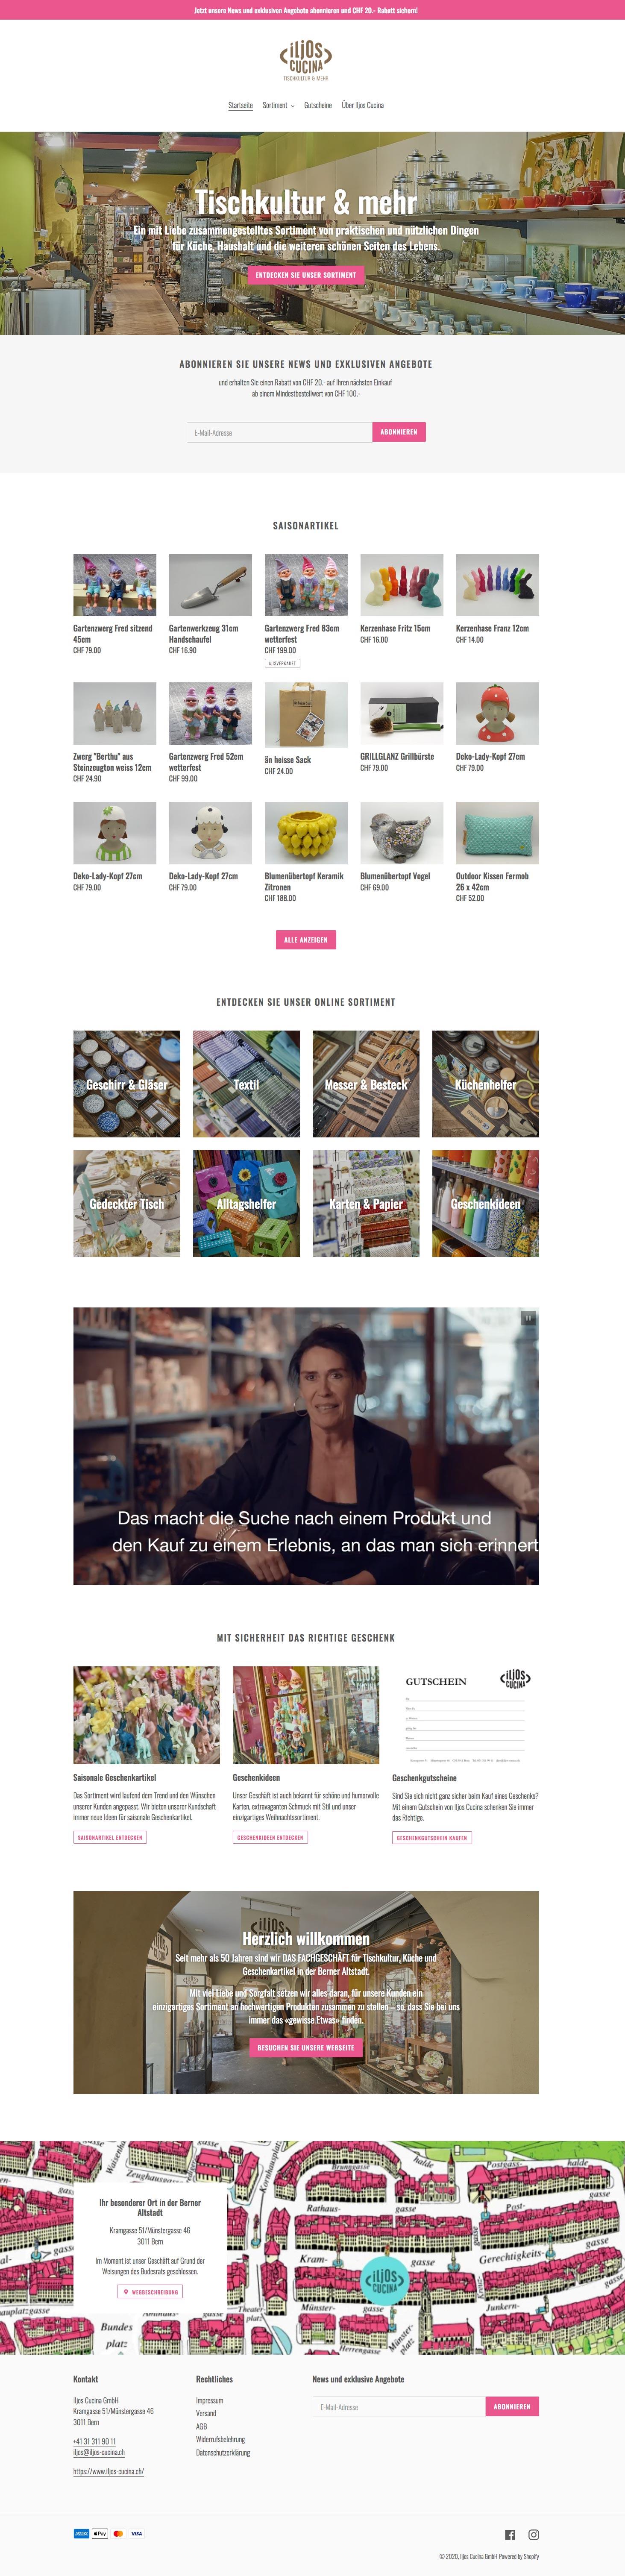 screenshot-shop.iljos-cucina.ch-2020.06.05-11_28_17_web